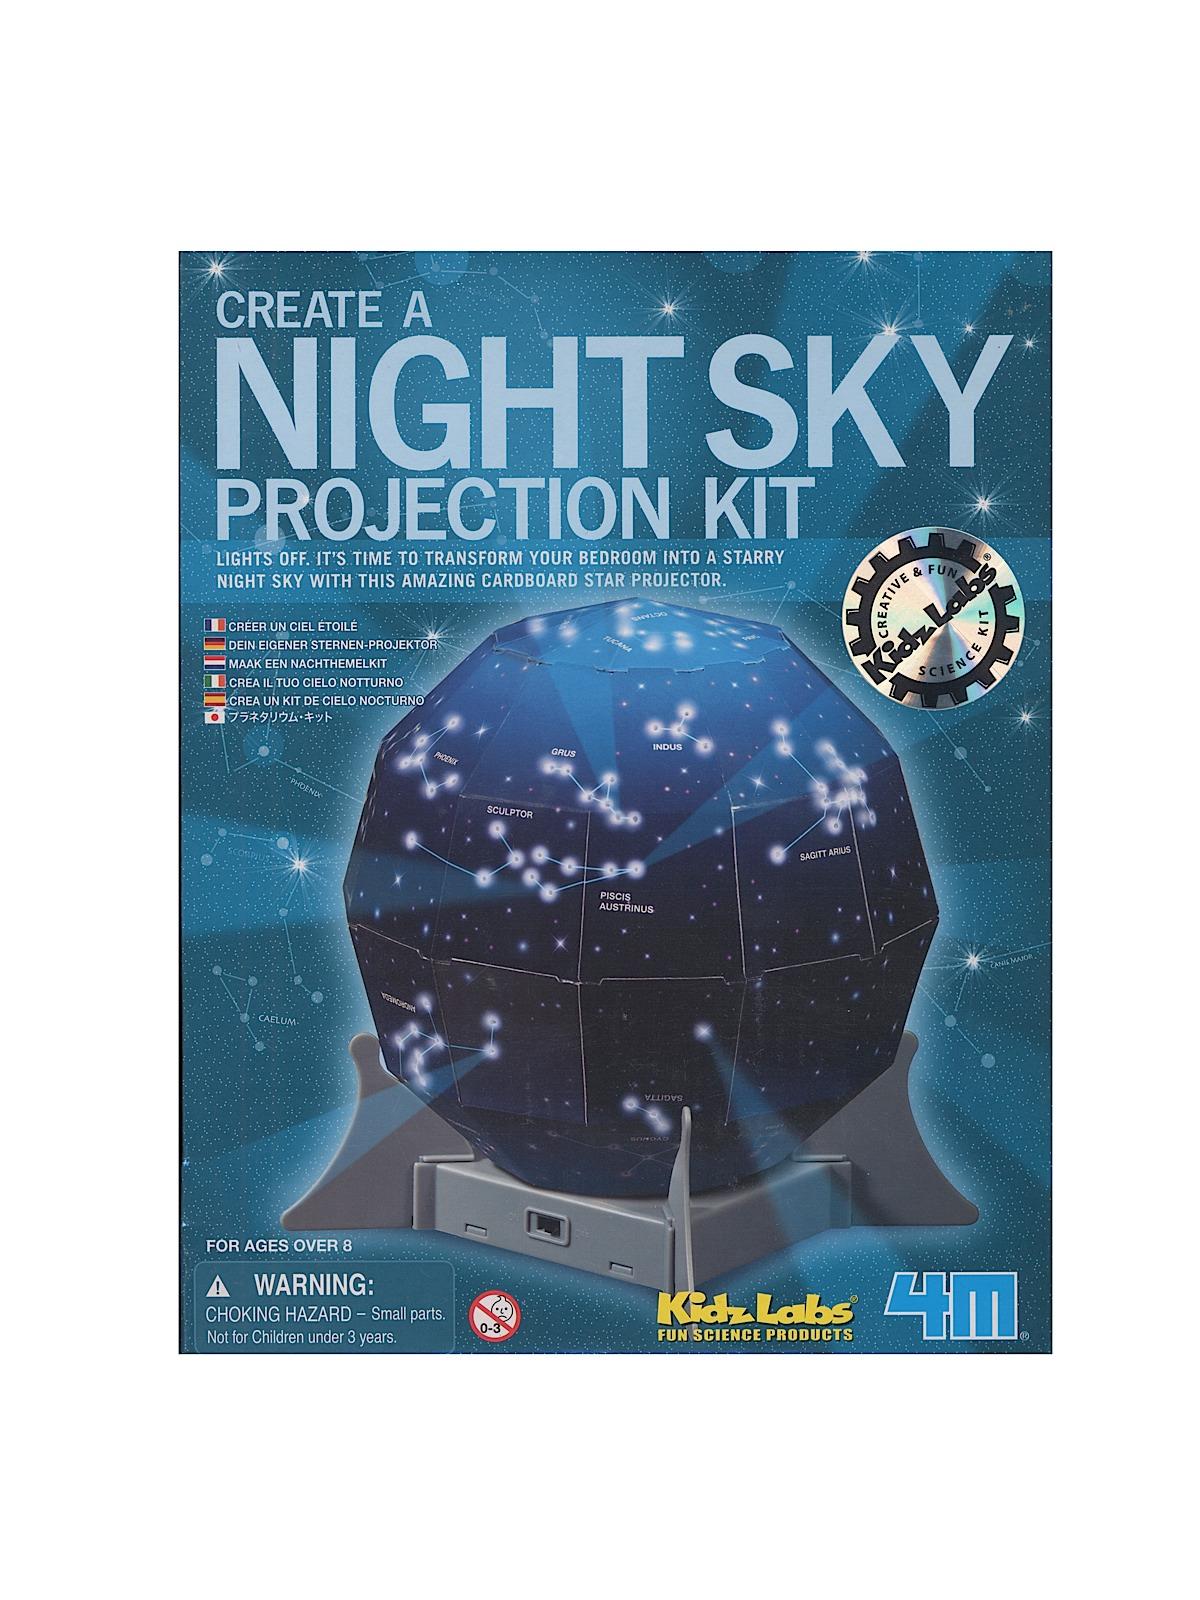 KidzLabs Night Sky Projection Kit